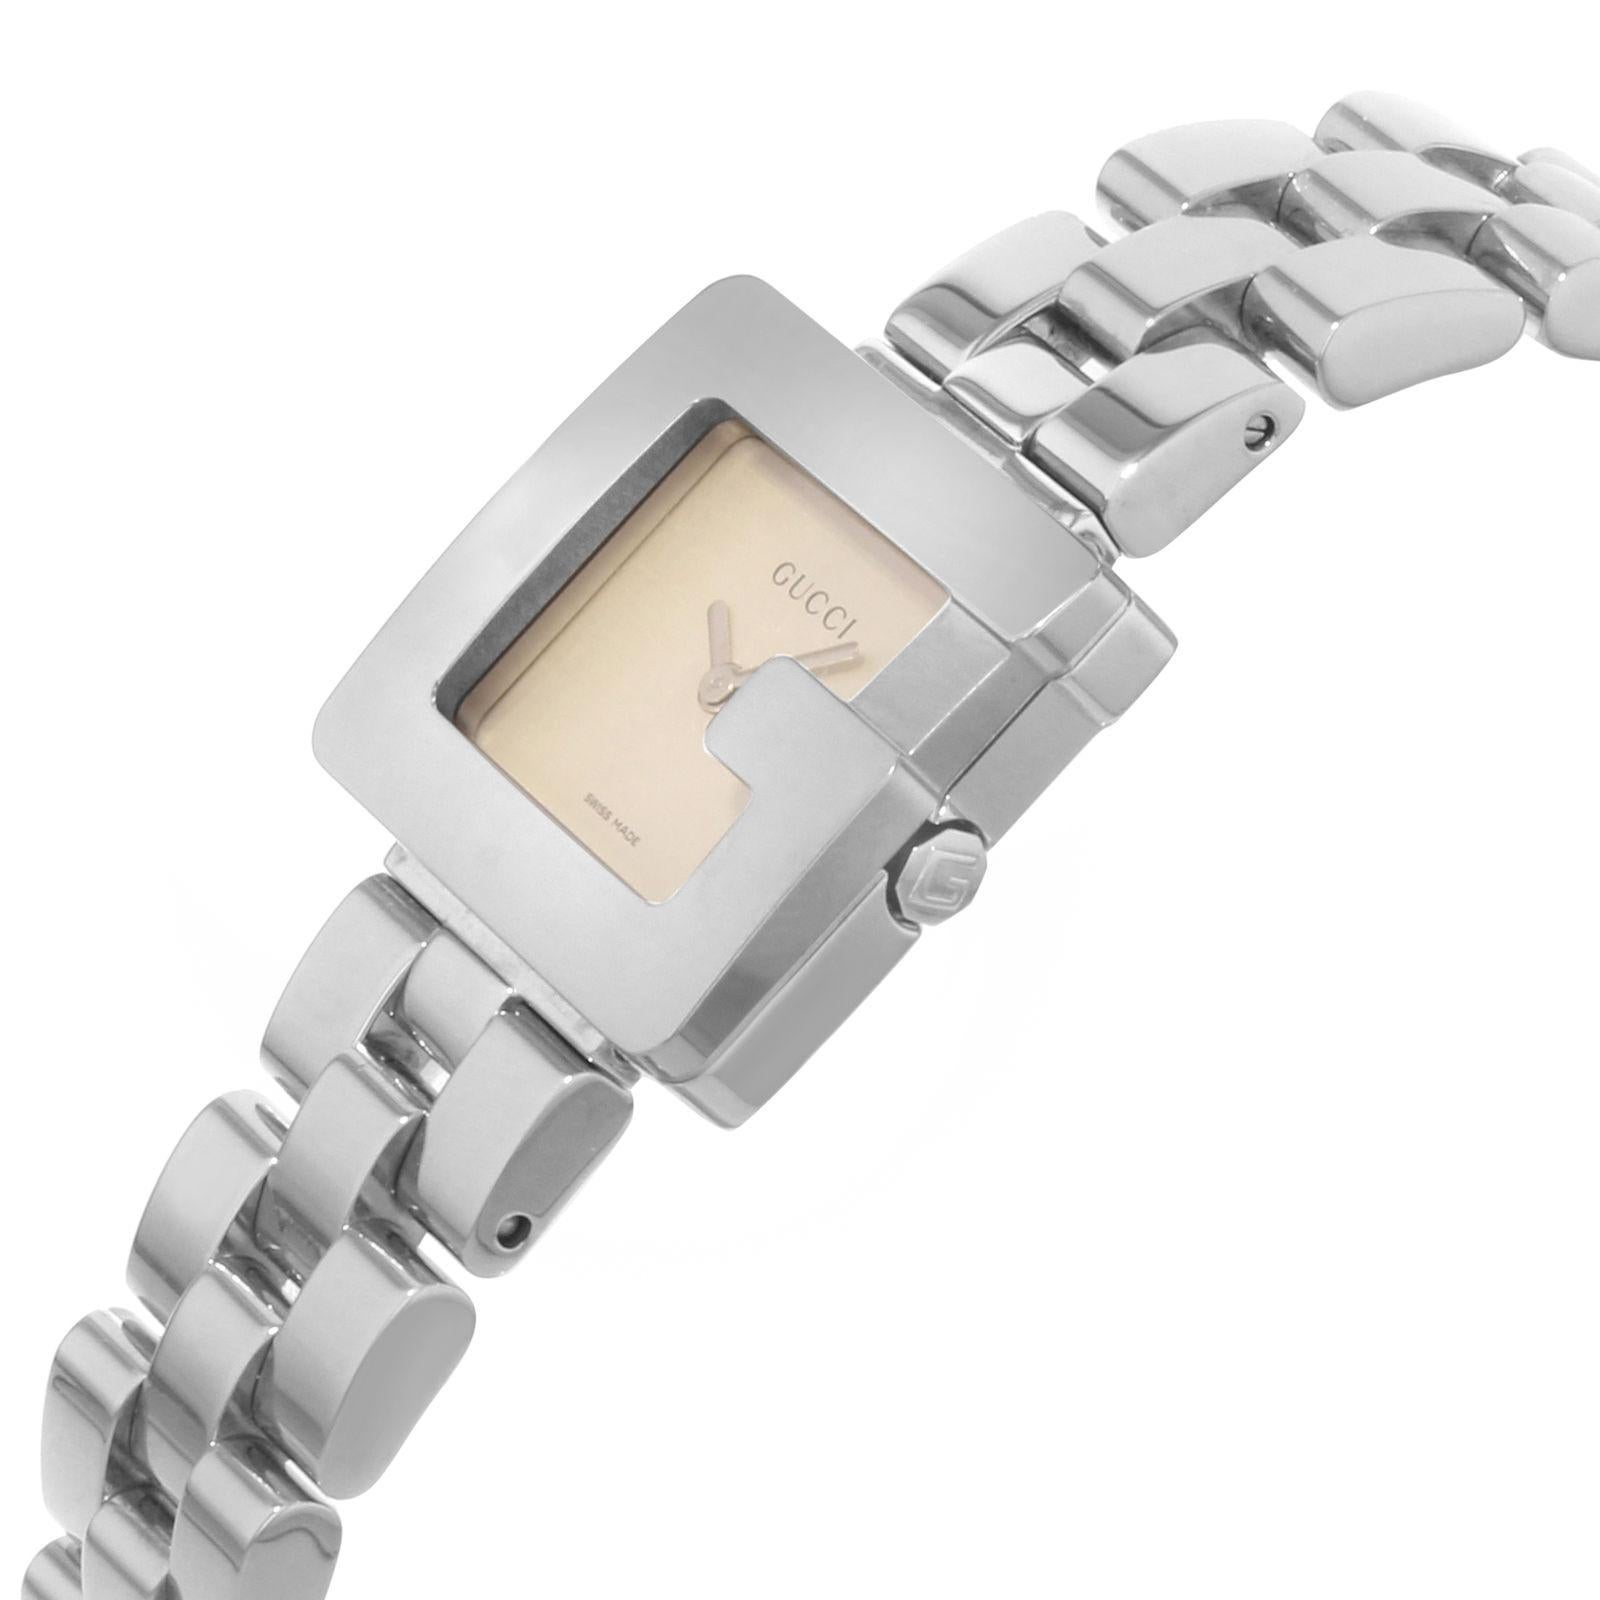 3ca72f78912 Gucci 3600L Square Face Silver Dial Steel Quartz Ladies Watch YA036504 For  Sale at 1stdibs